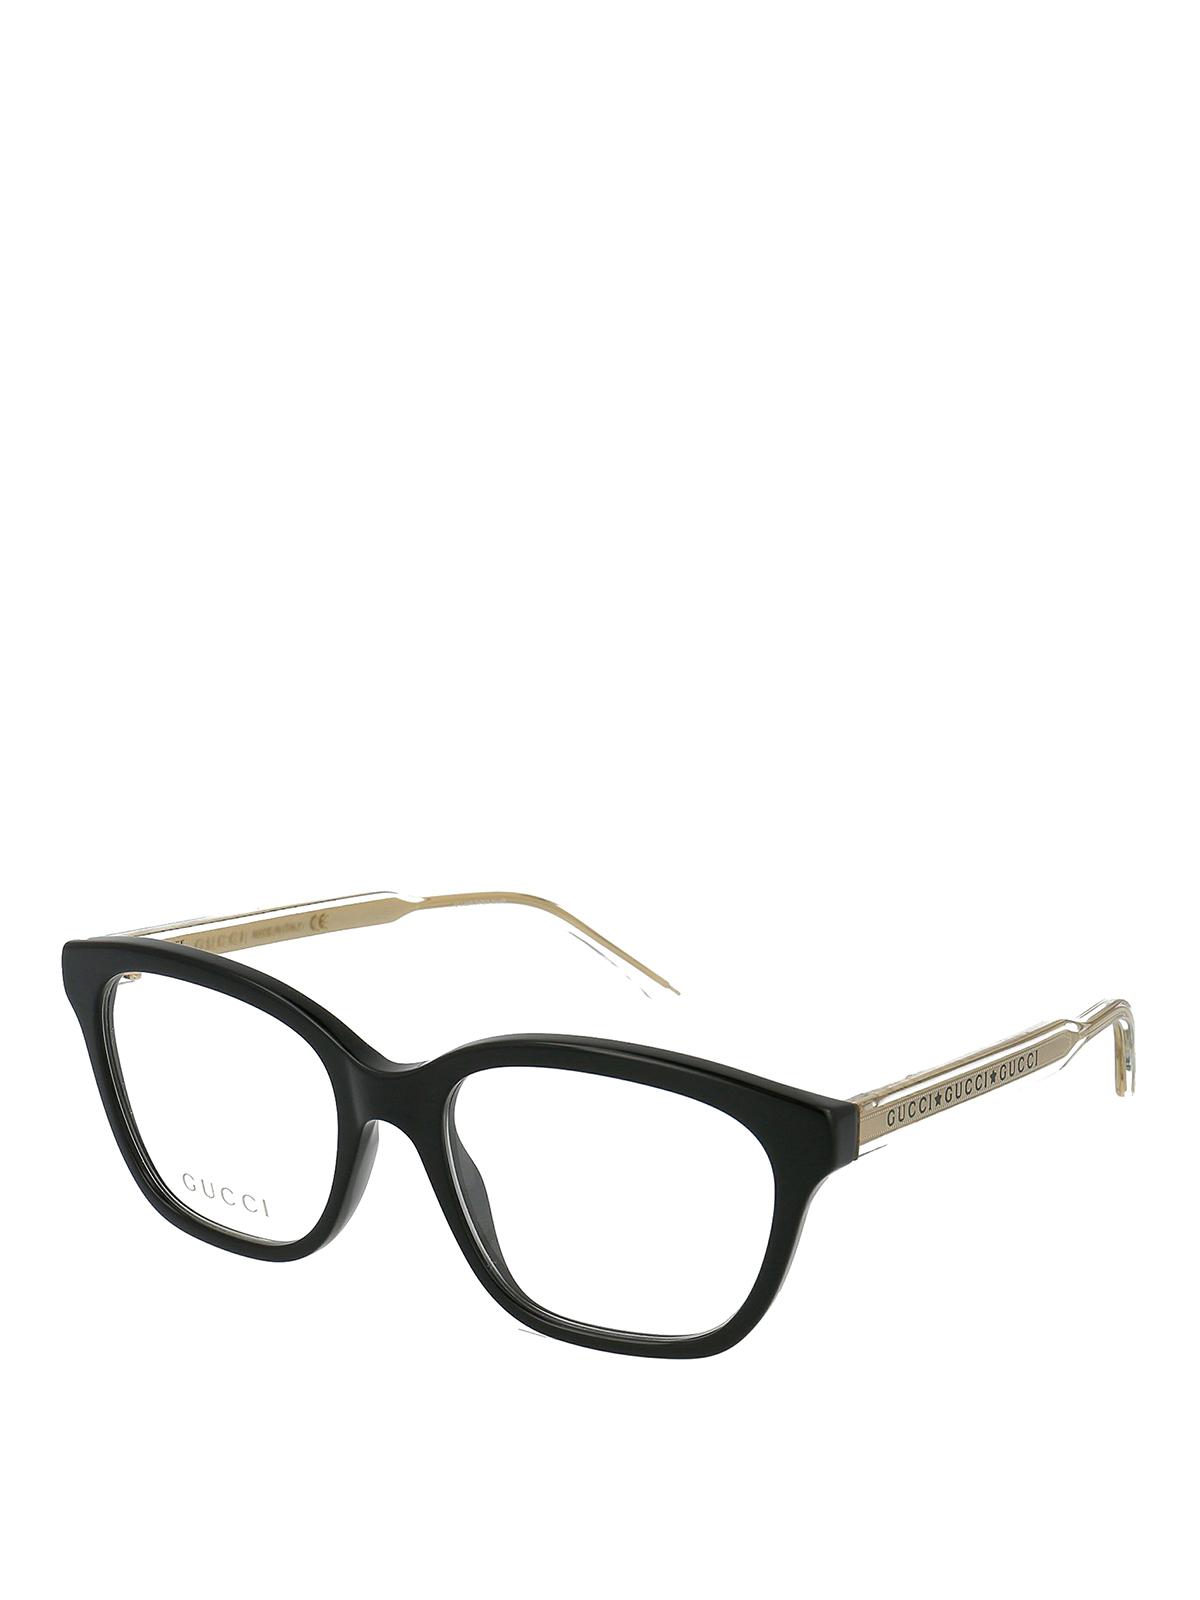 Gucci Sheer Temple Black Wayfarer Glasses